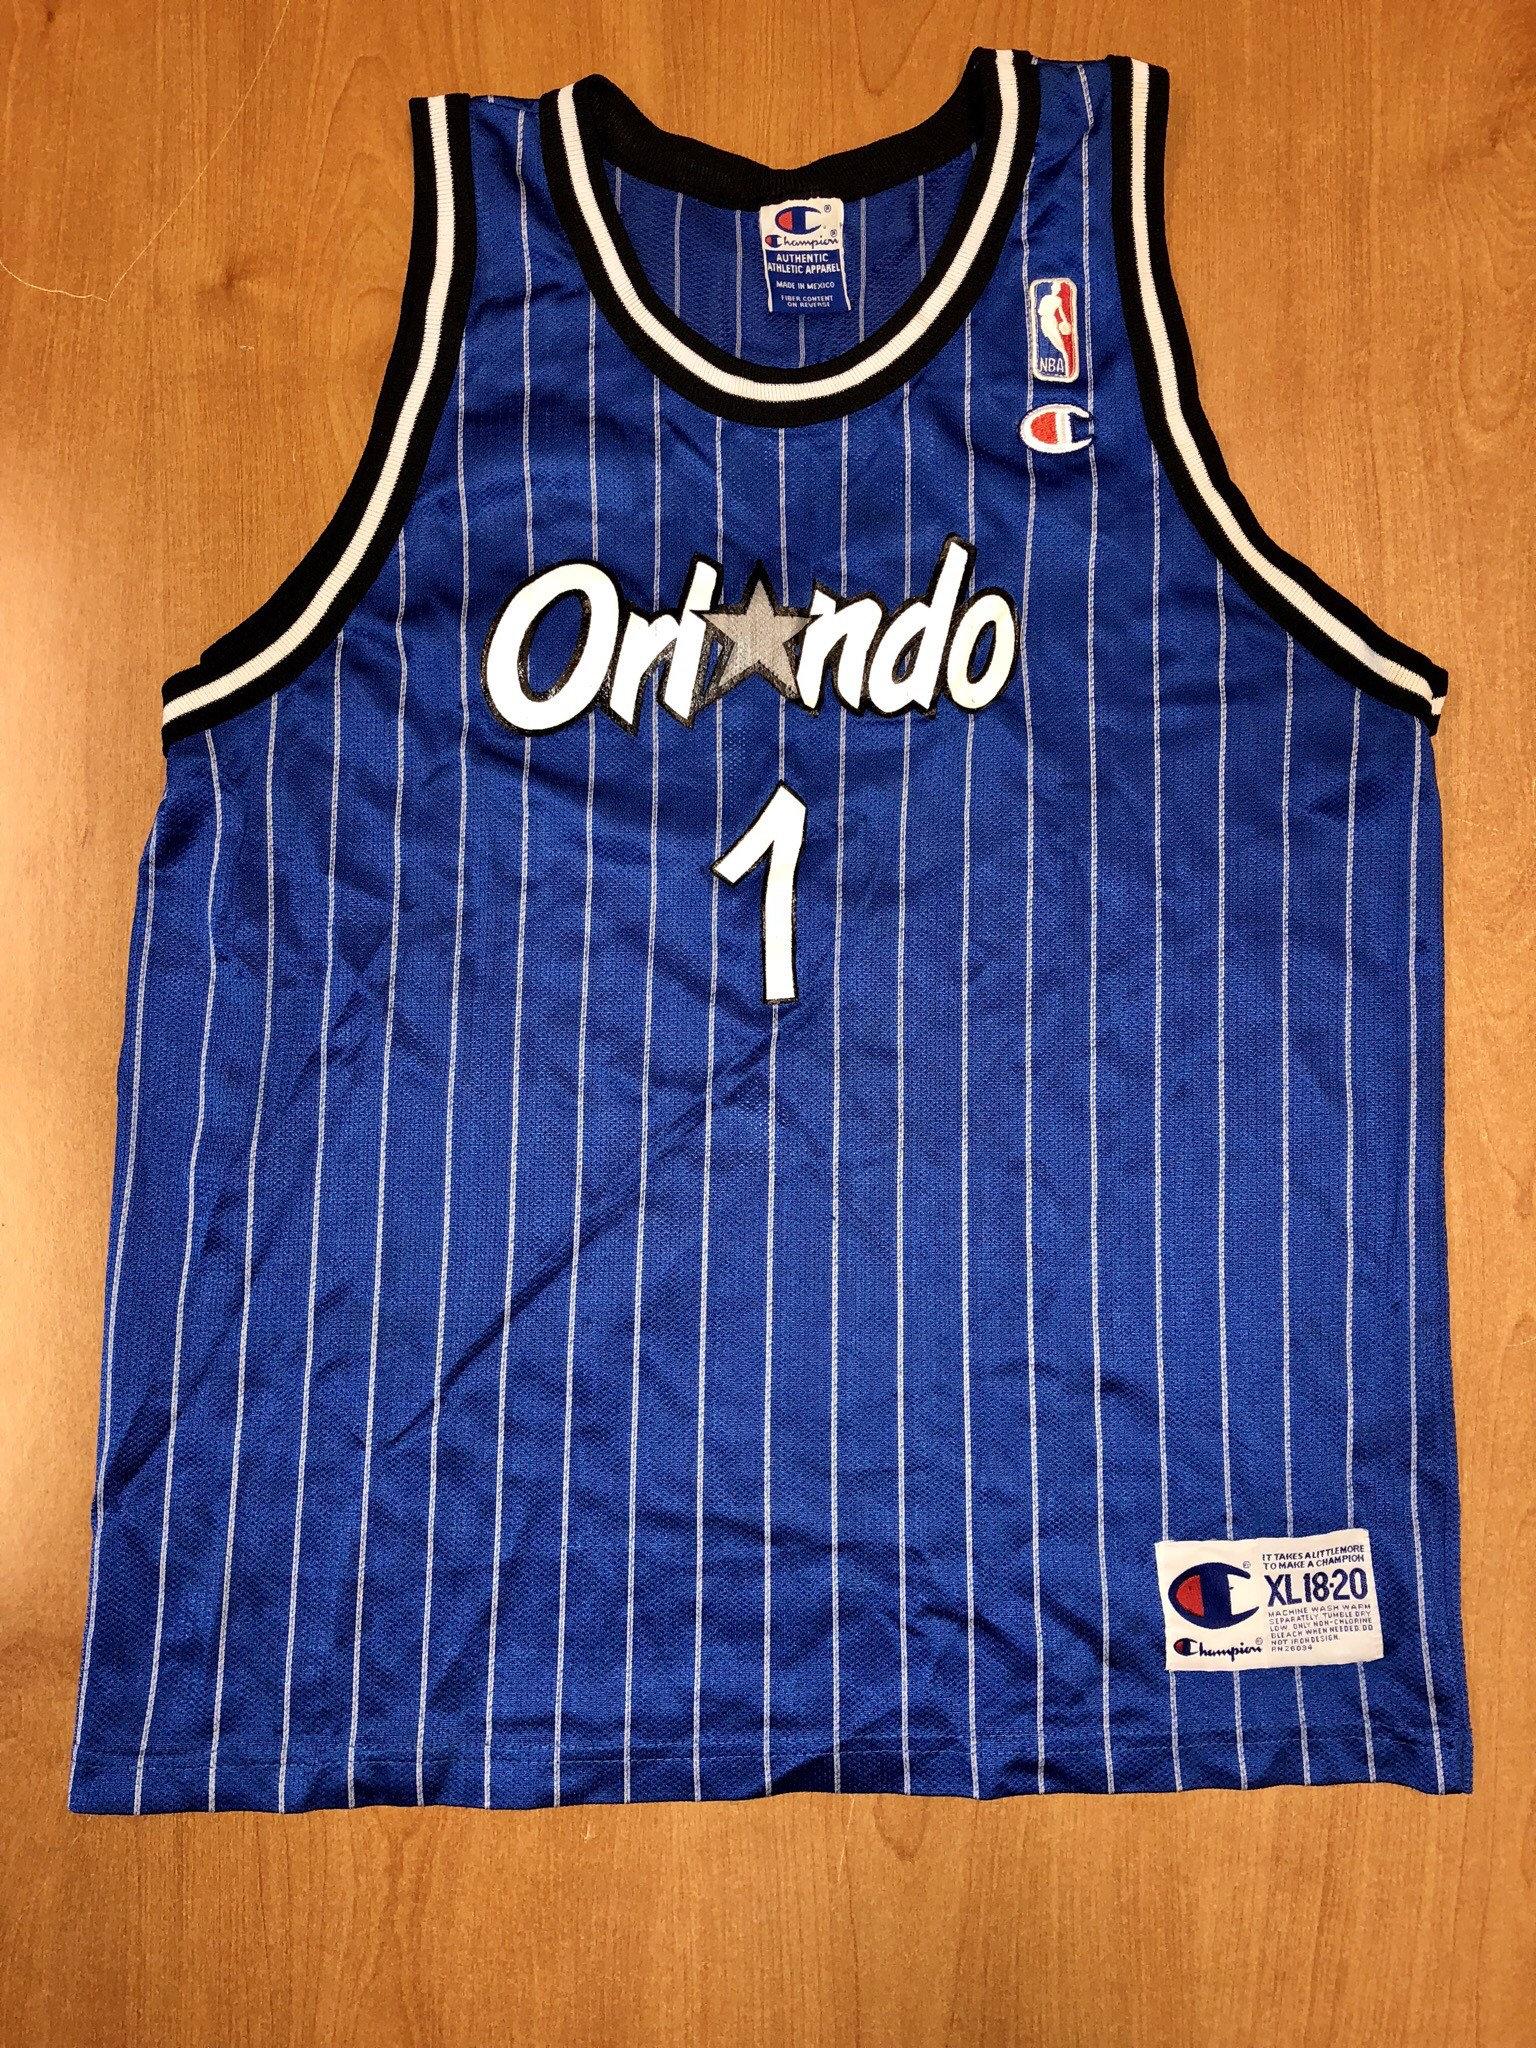 Vintage 1998 Penny Hardaway Orlando Magic Champion Jersey Size  4e375fe02